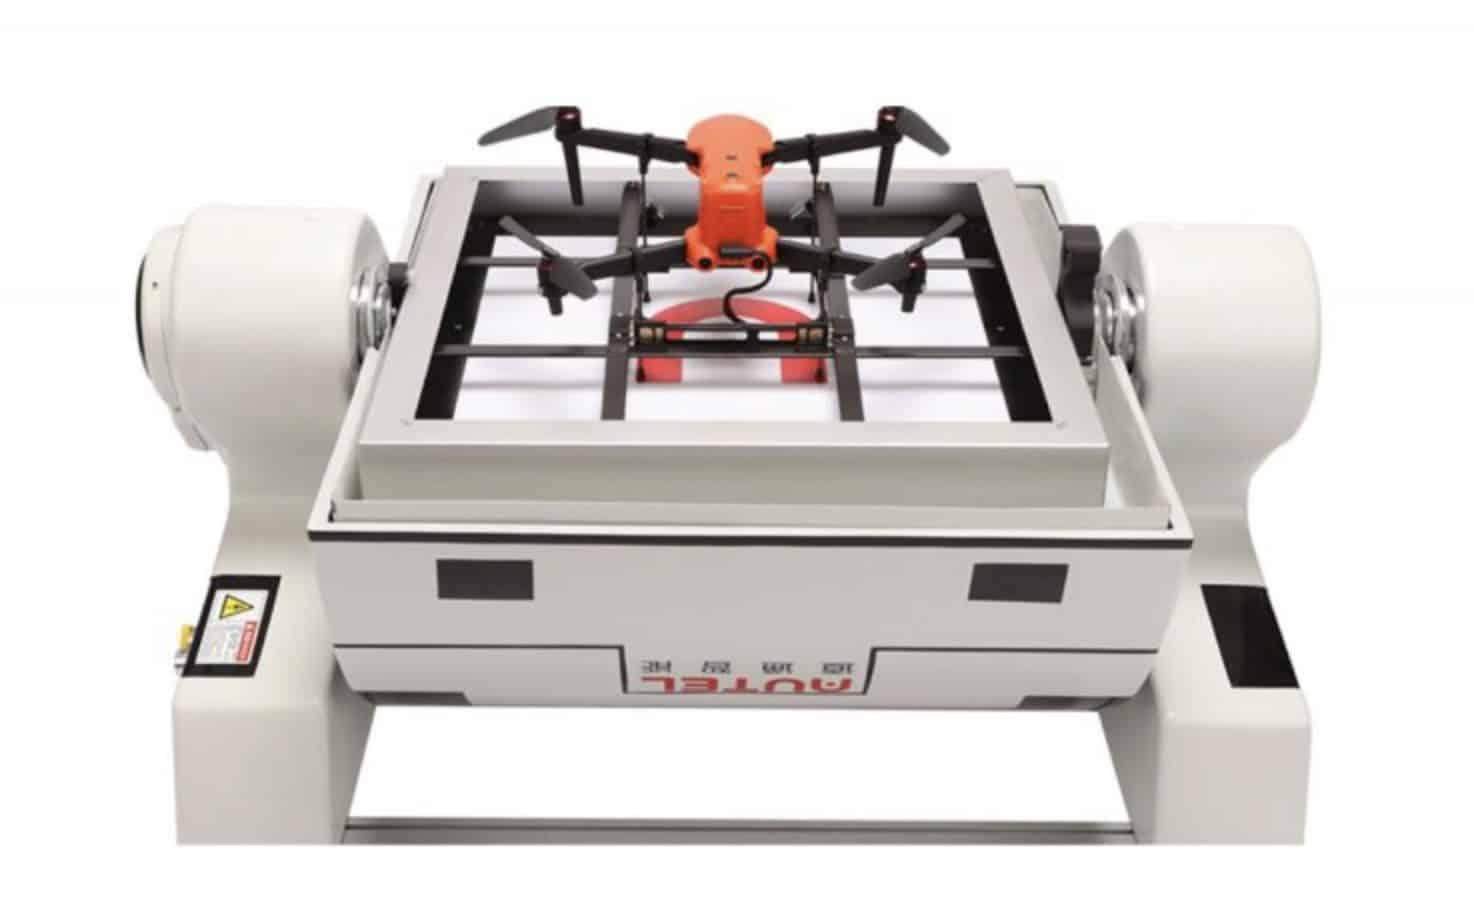 Autel Introduces EVO II Series Drone Docking Station